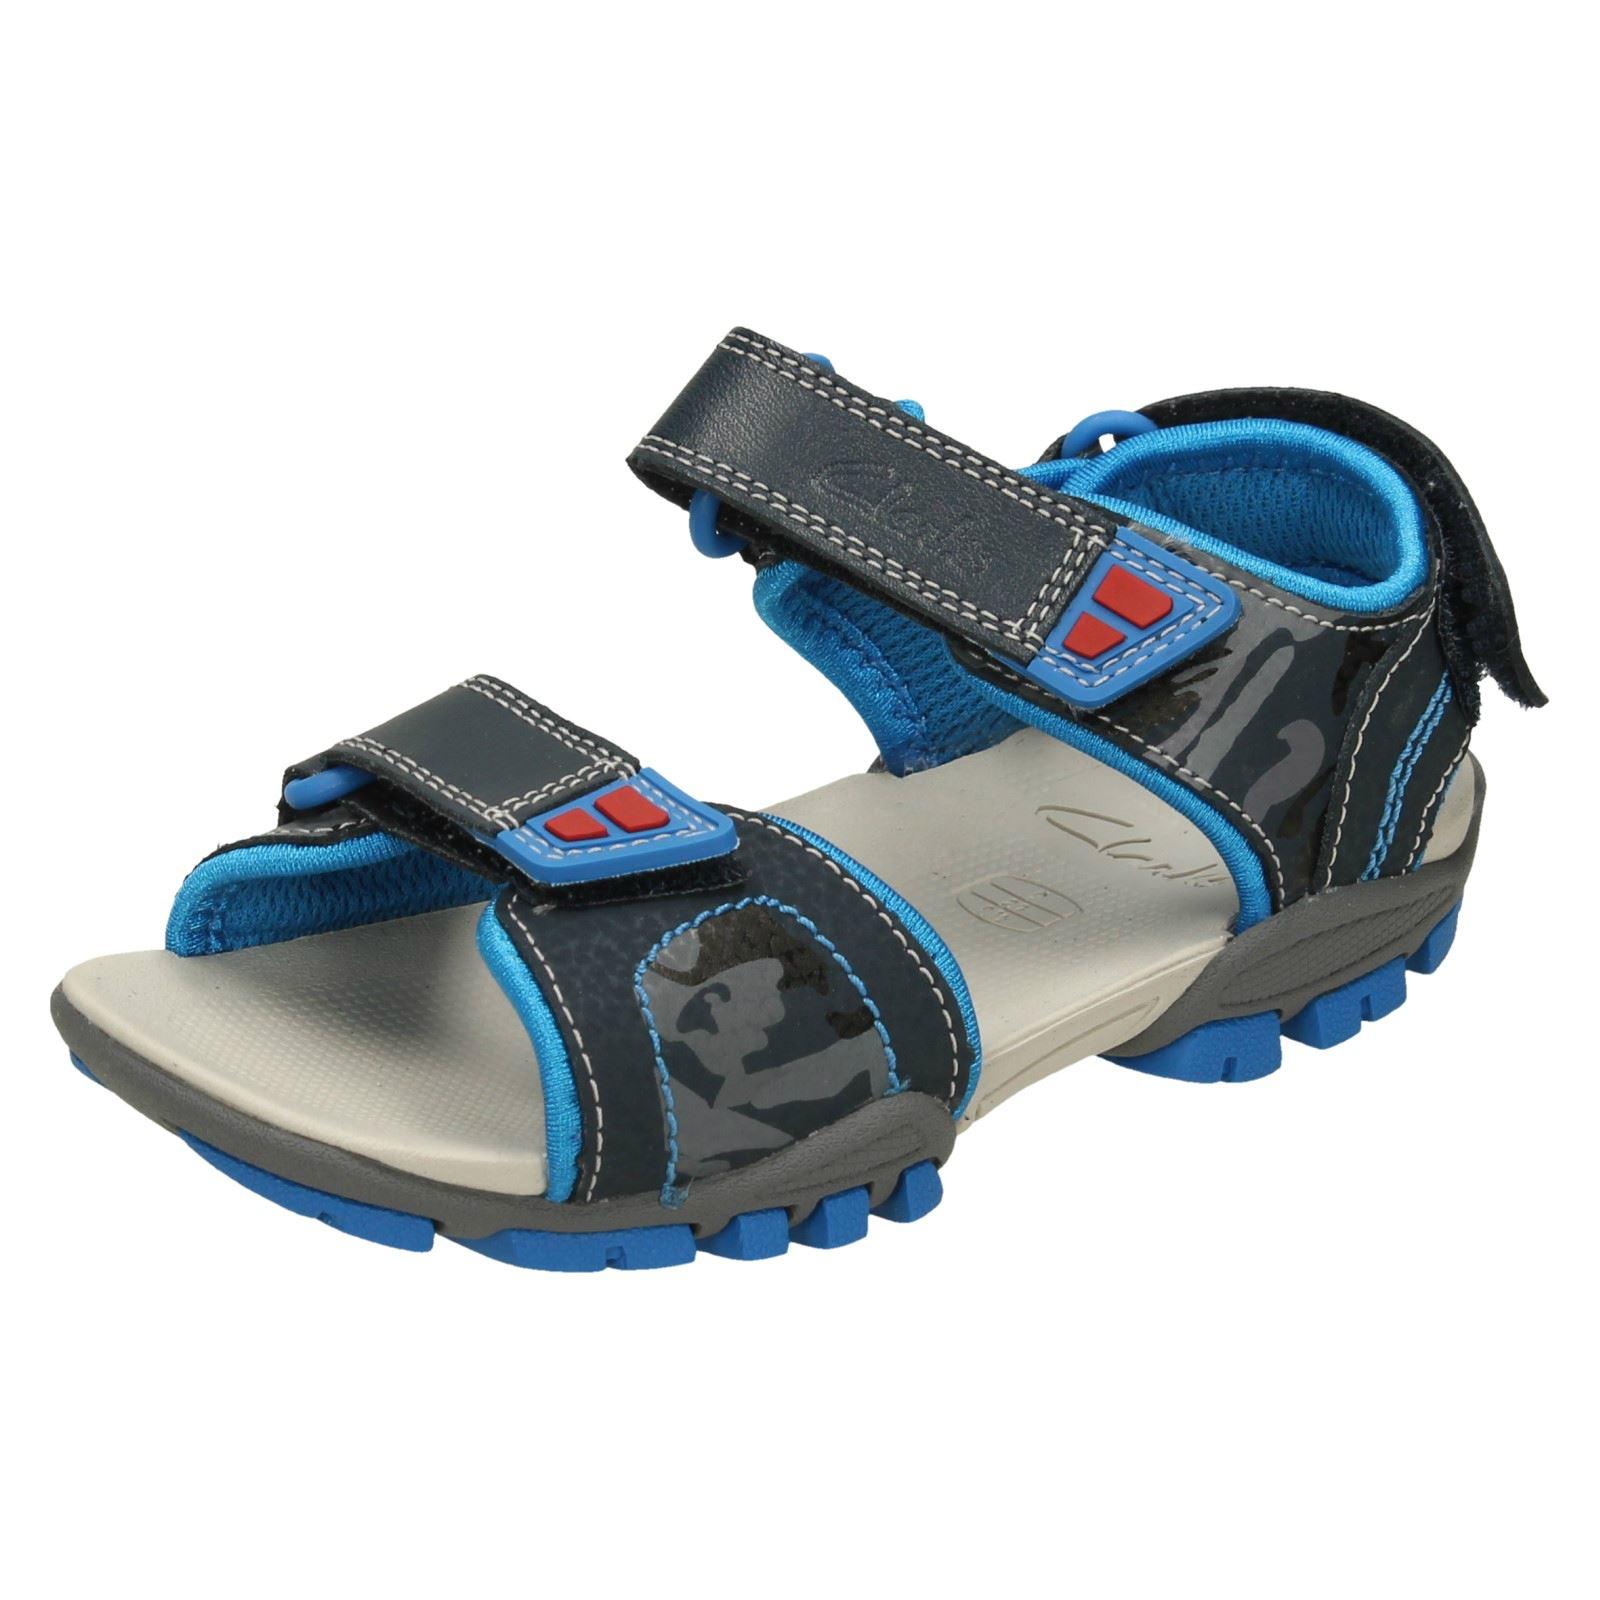 Clarks Boys Sandals - Zalmo Go  b9e9f26d8965